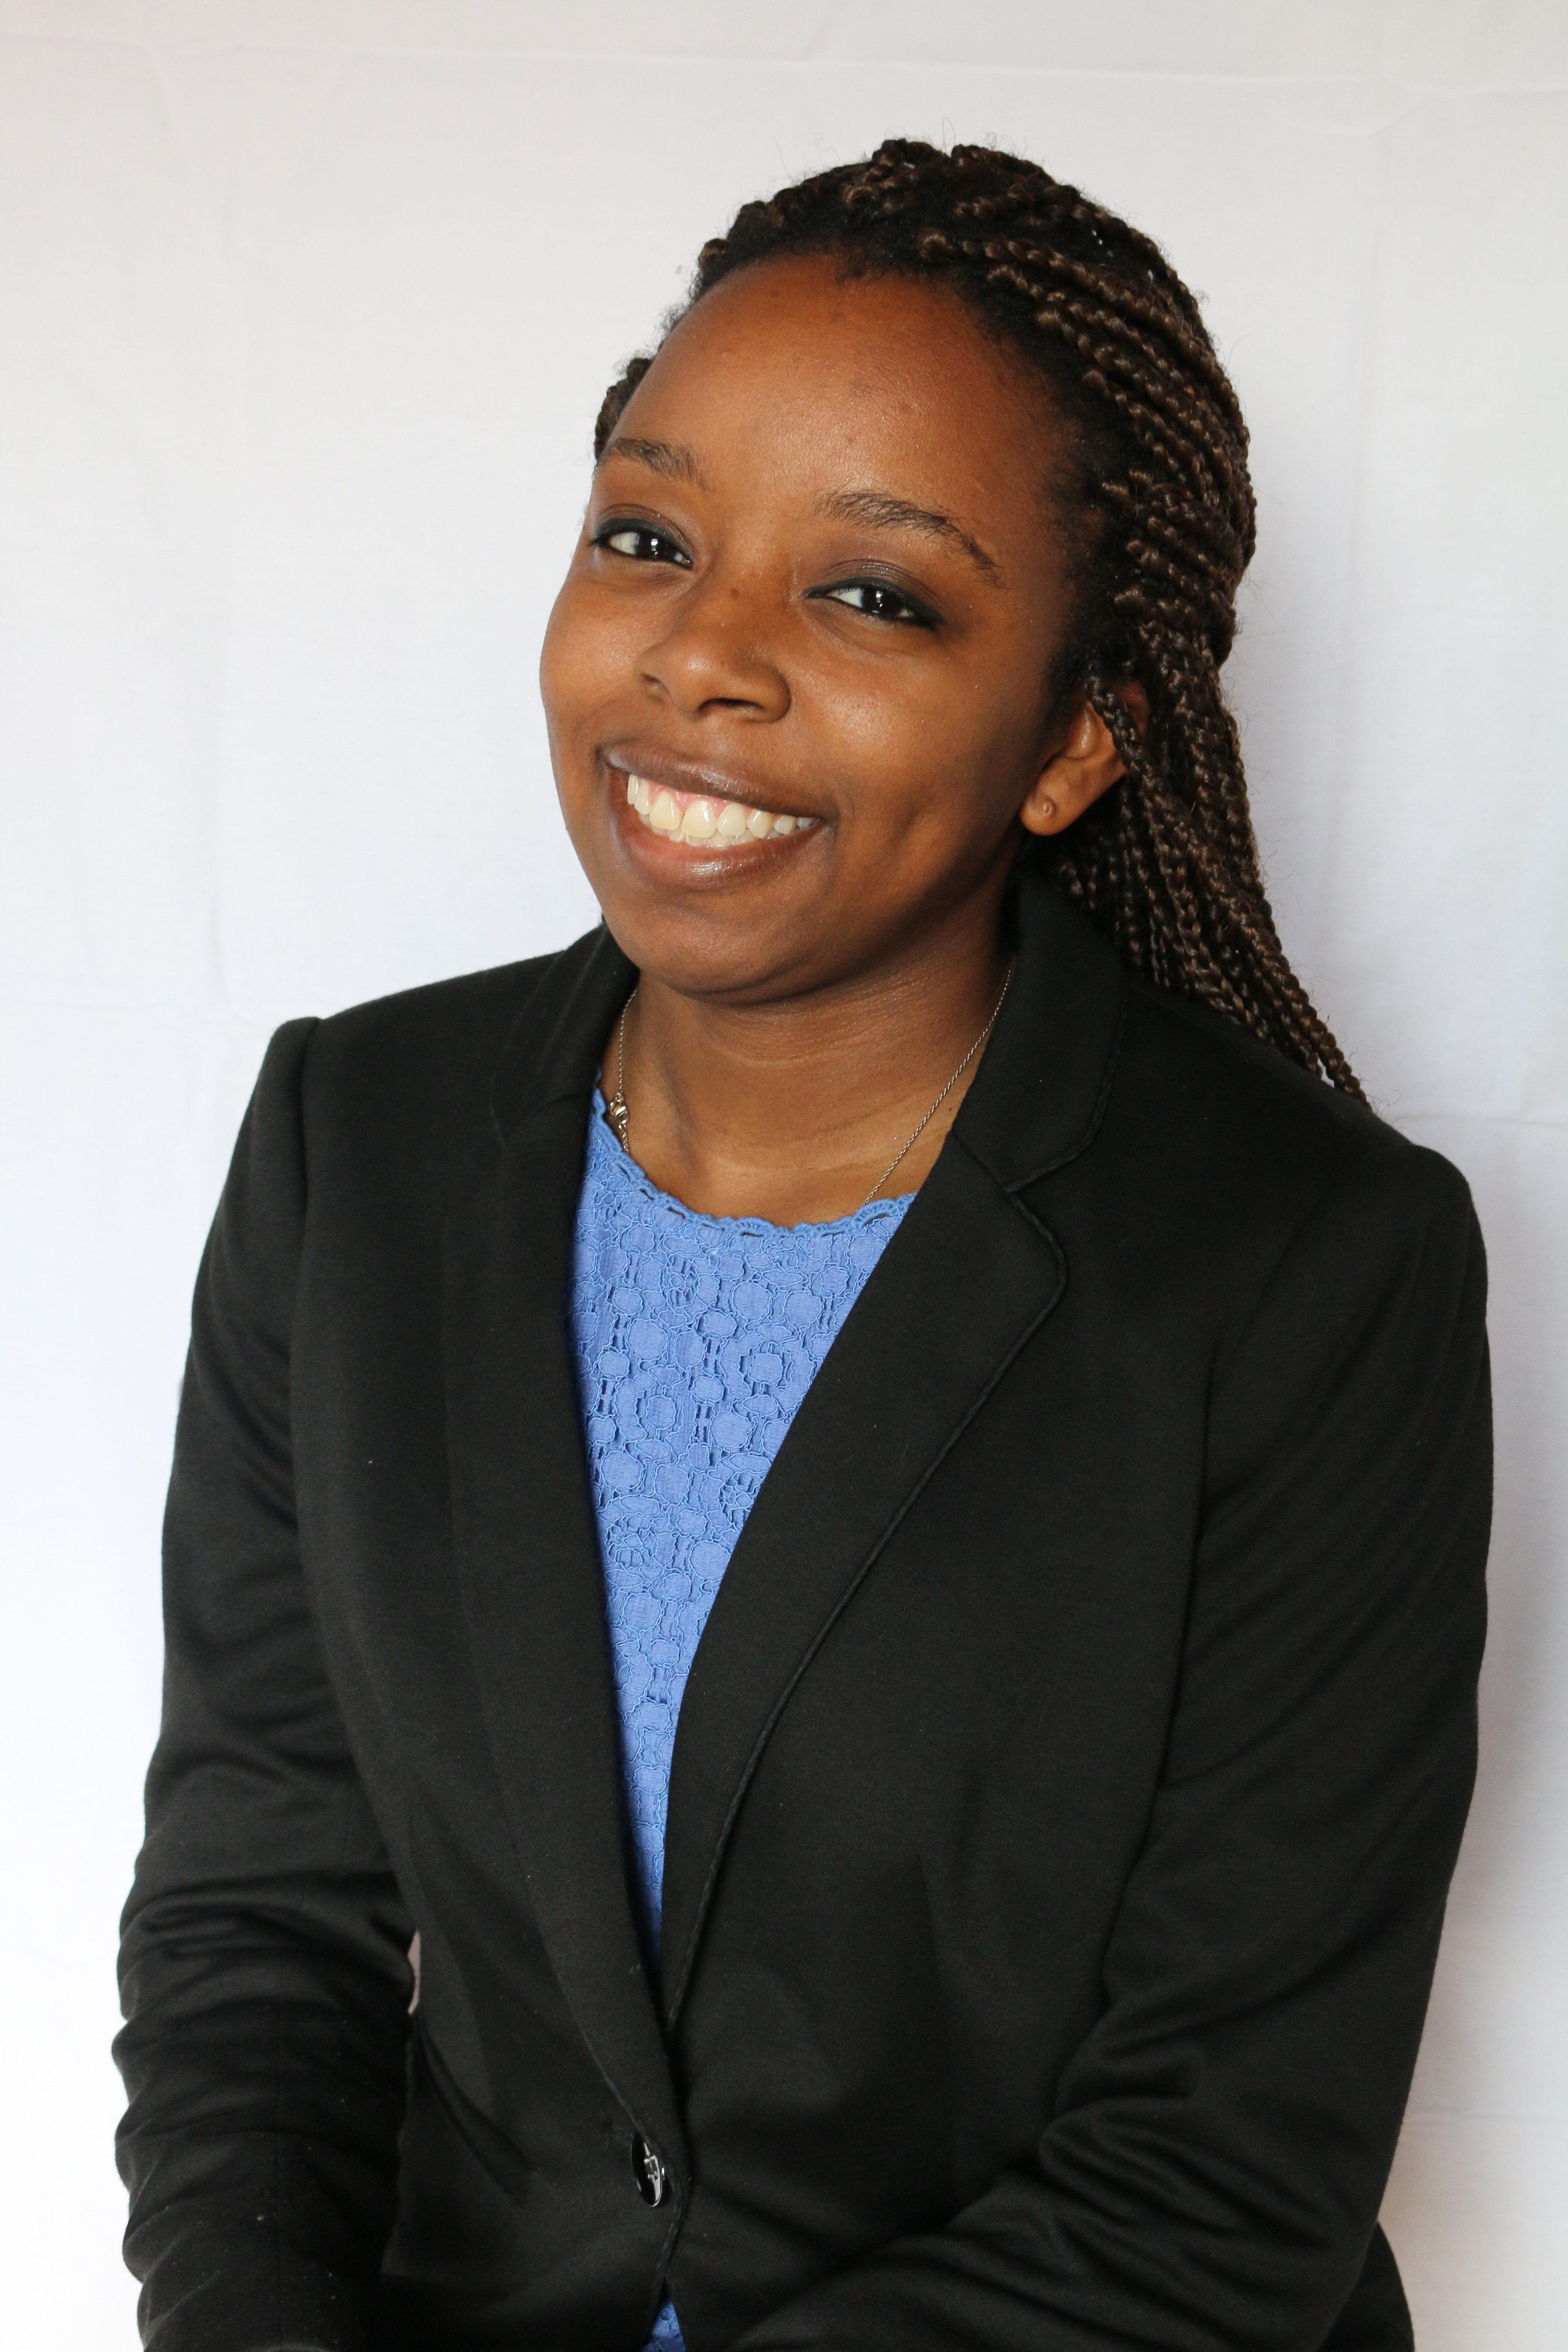 Natalie Doe M.A. : Public Relations Consultant